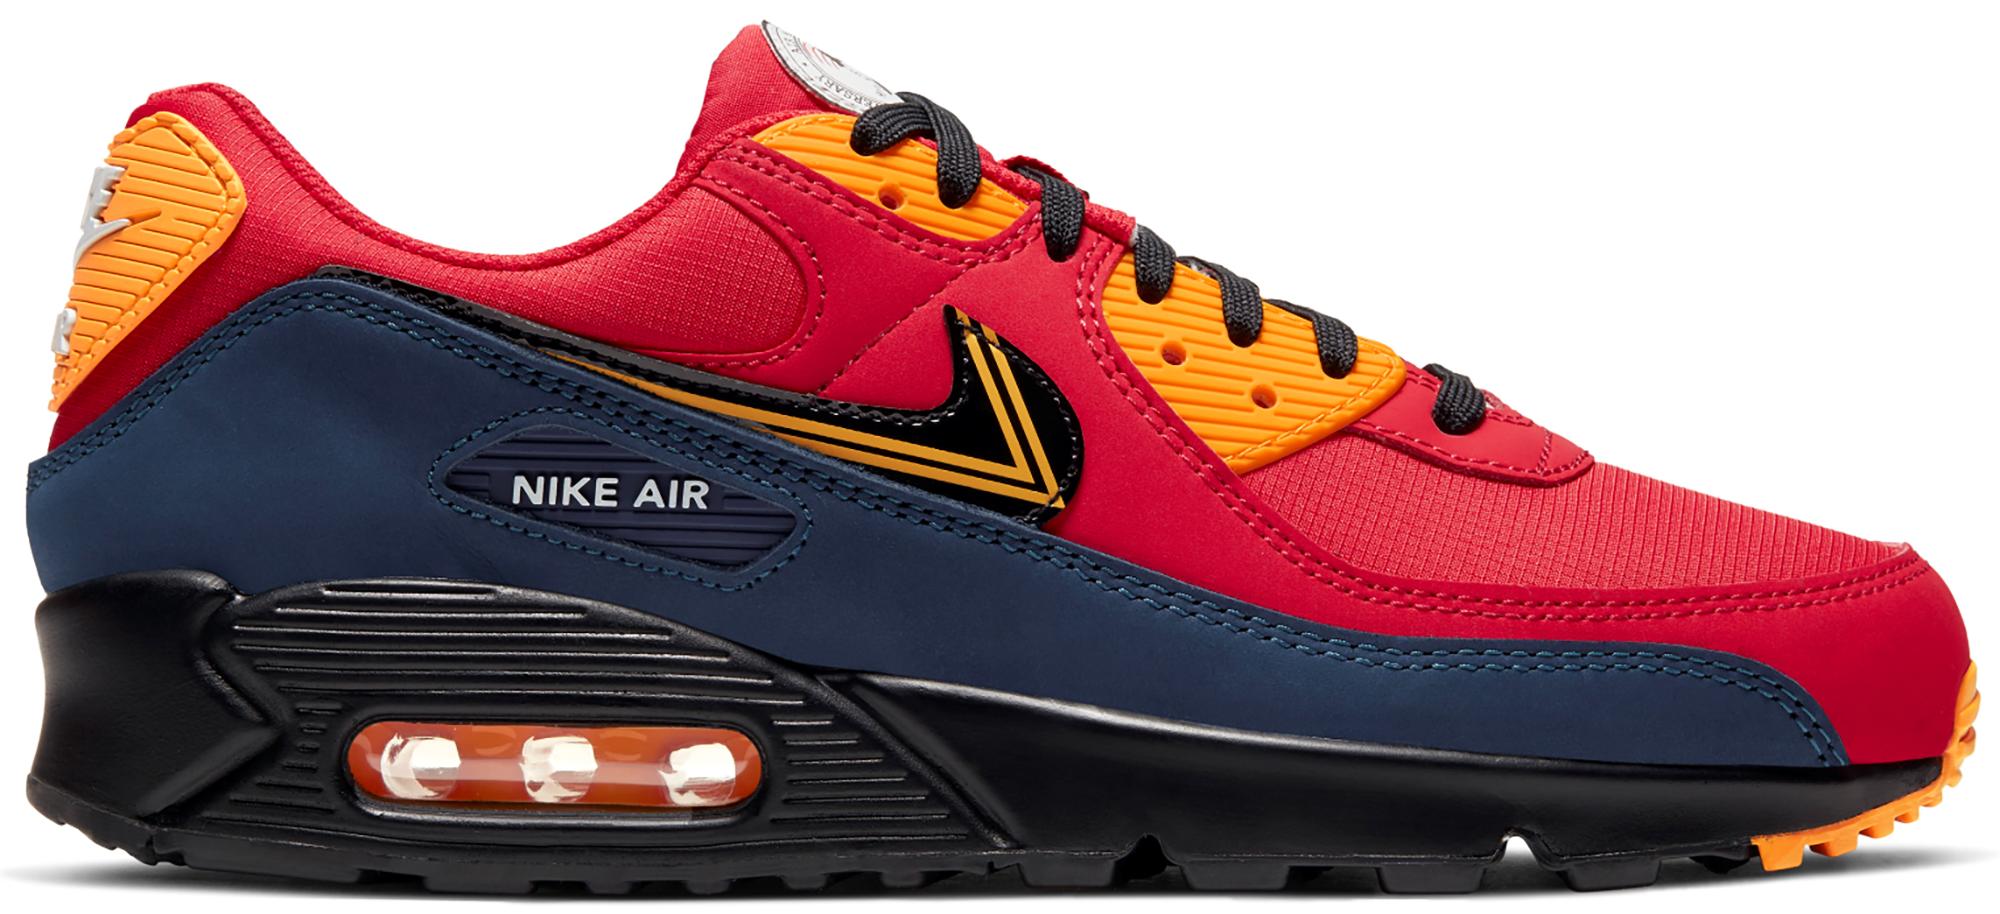 Nike Air Max 90 City Pack London (2020